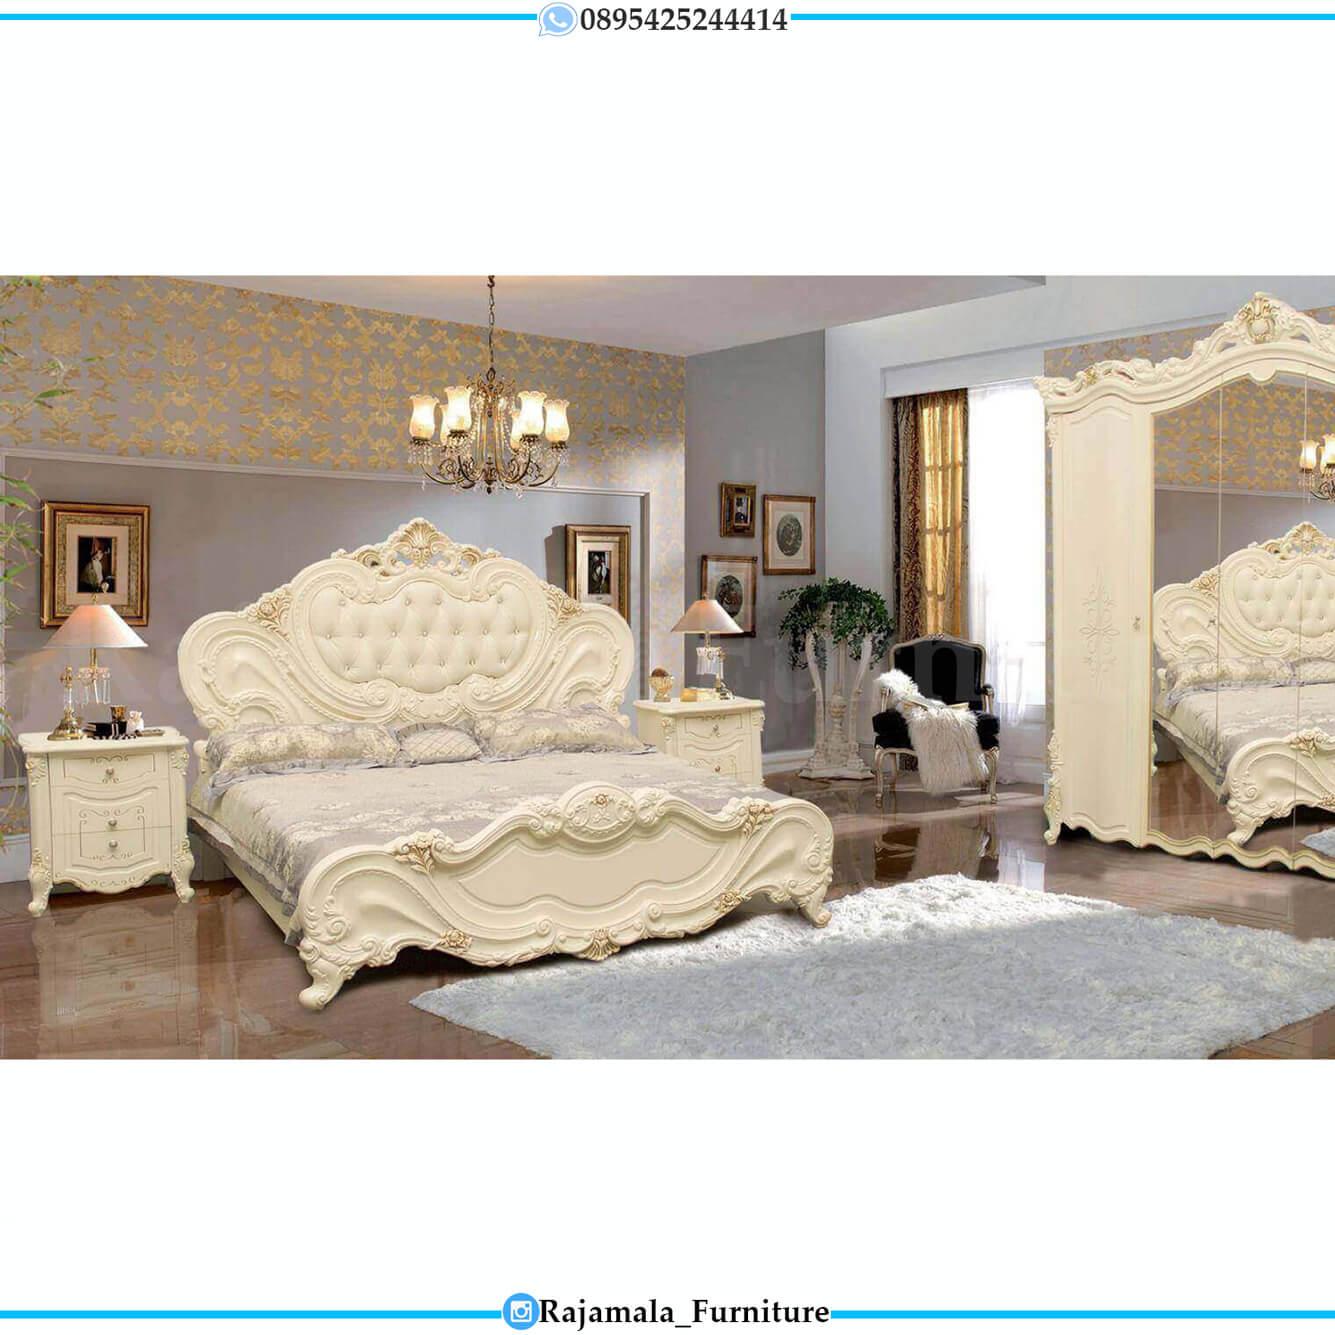 Jual Kamar Set Ukiran Jepara Luxury Carving Classic Model RM-0229